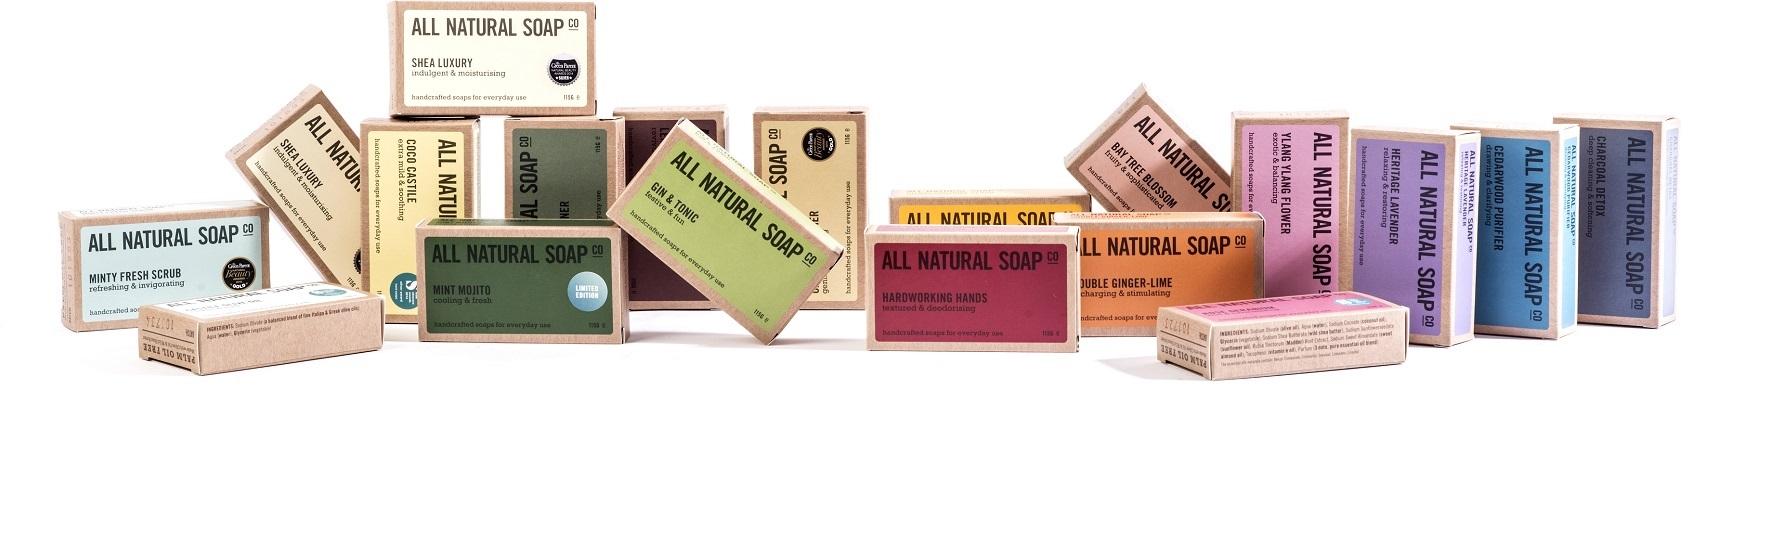 Seasonal-Soaps_ALL-NATURAL-SOAP-Co-1